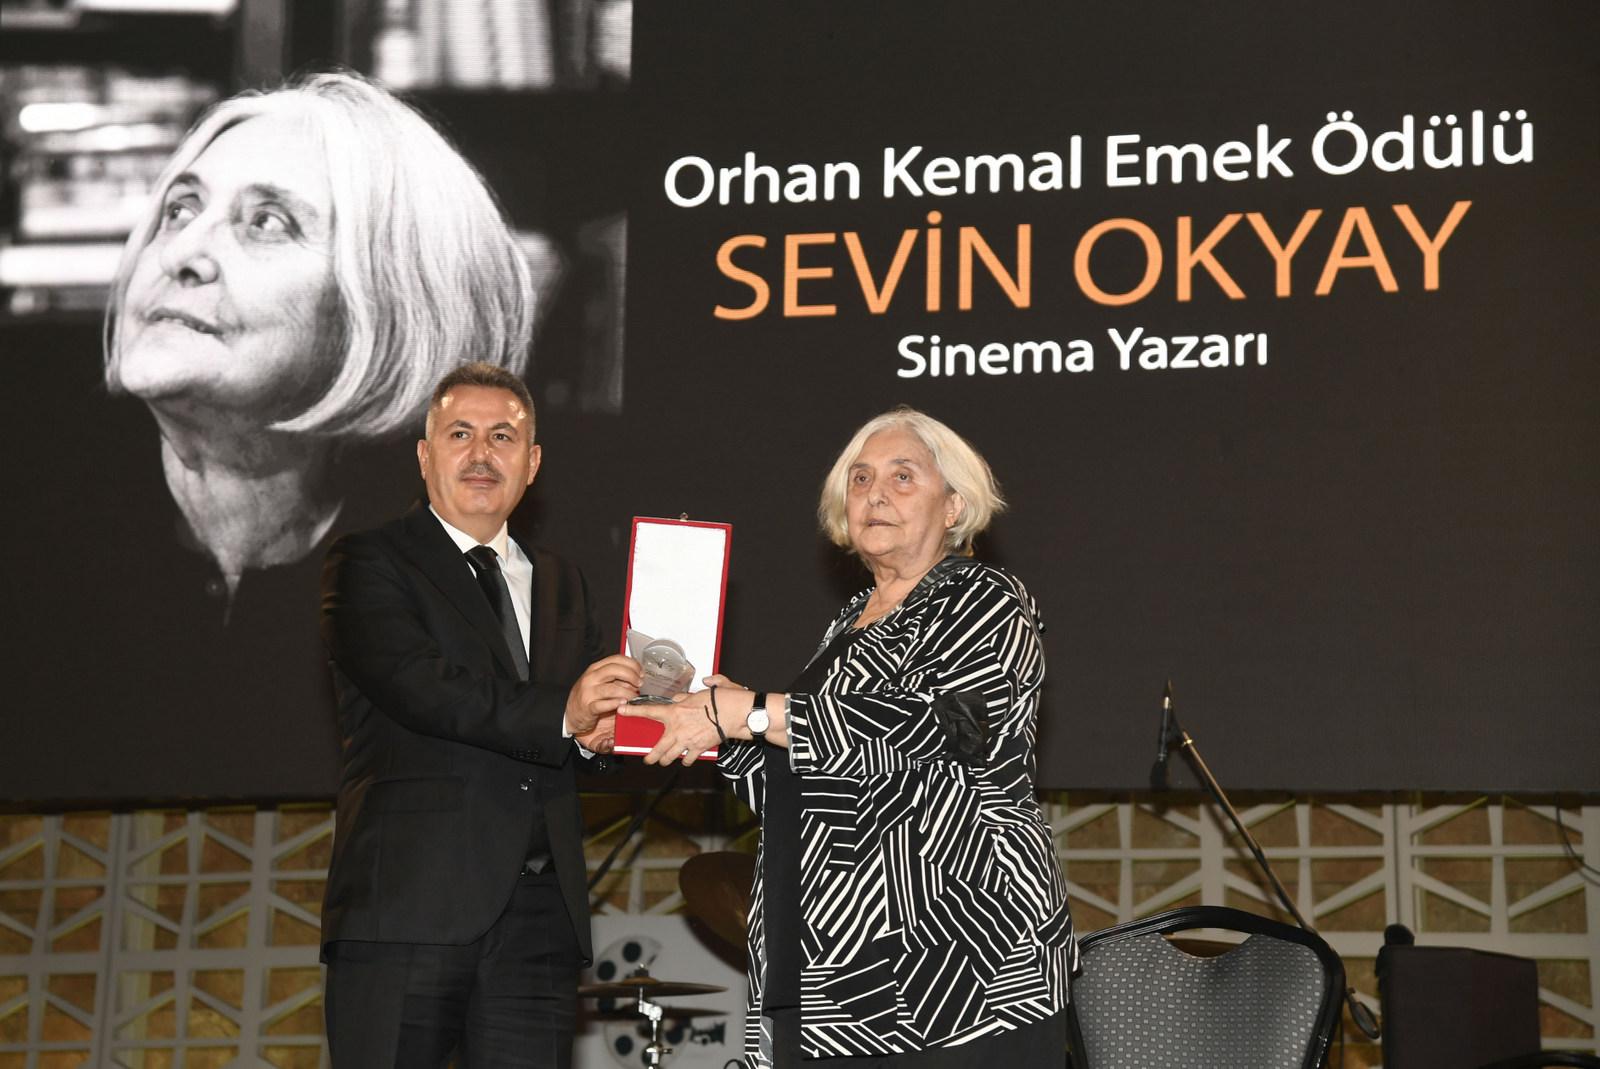 Adana Altın Koza (Sevin Okyay).jpg